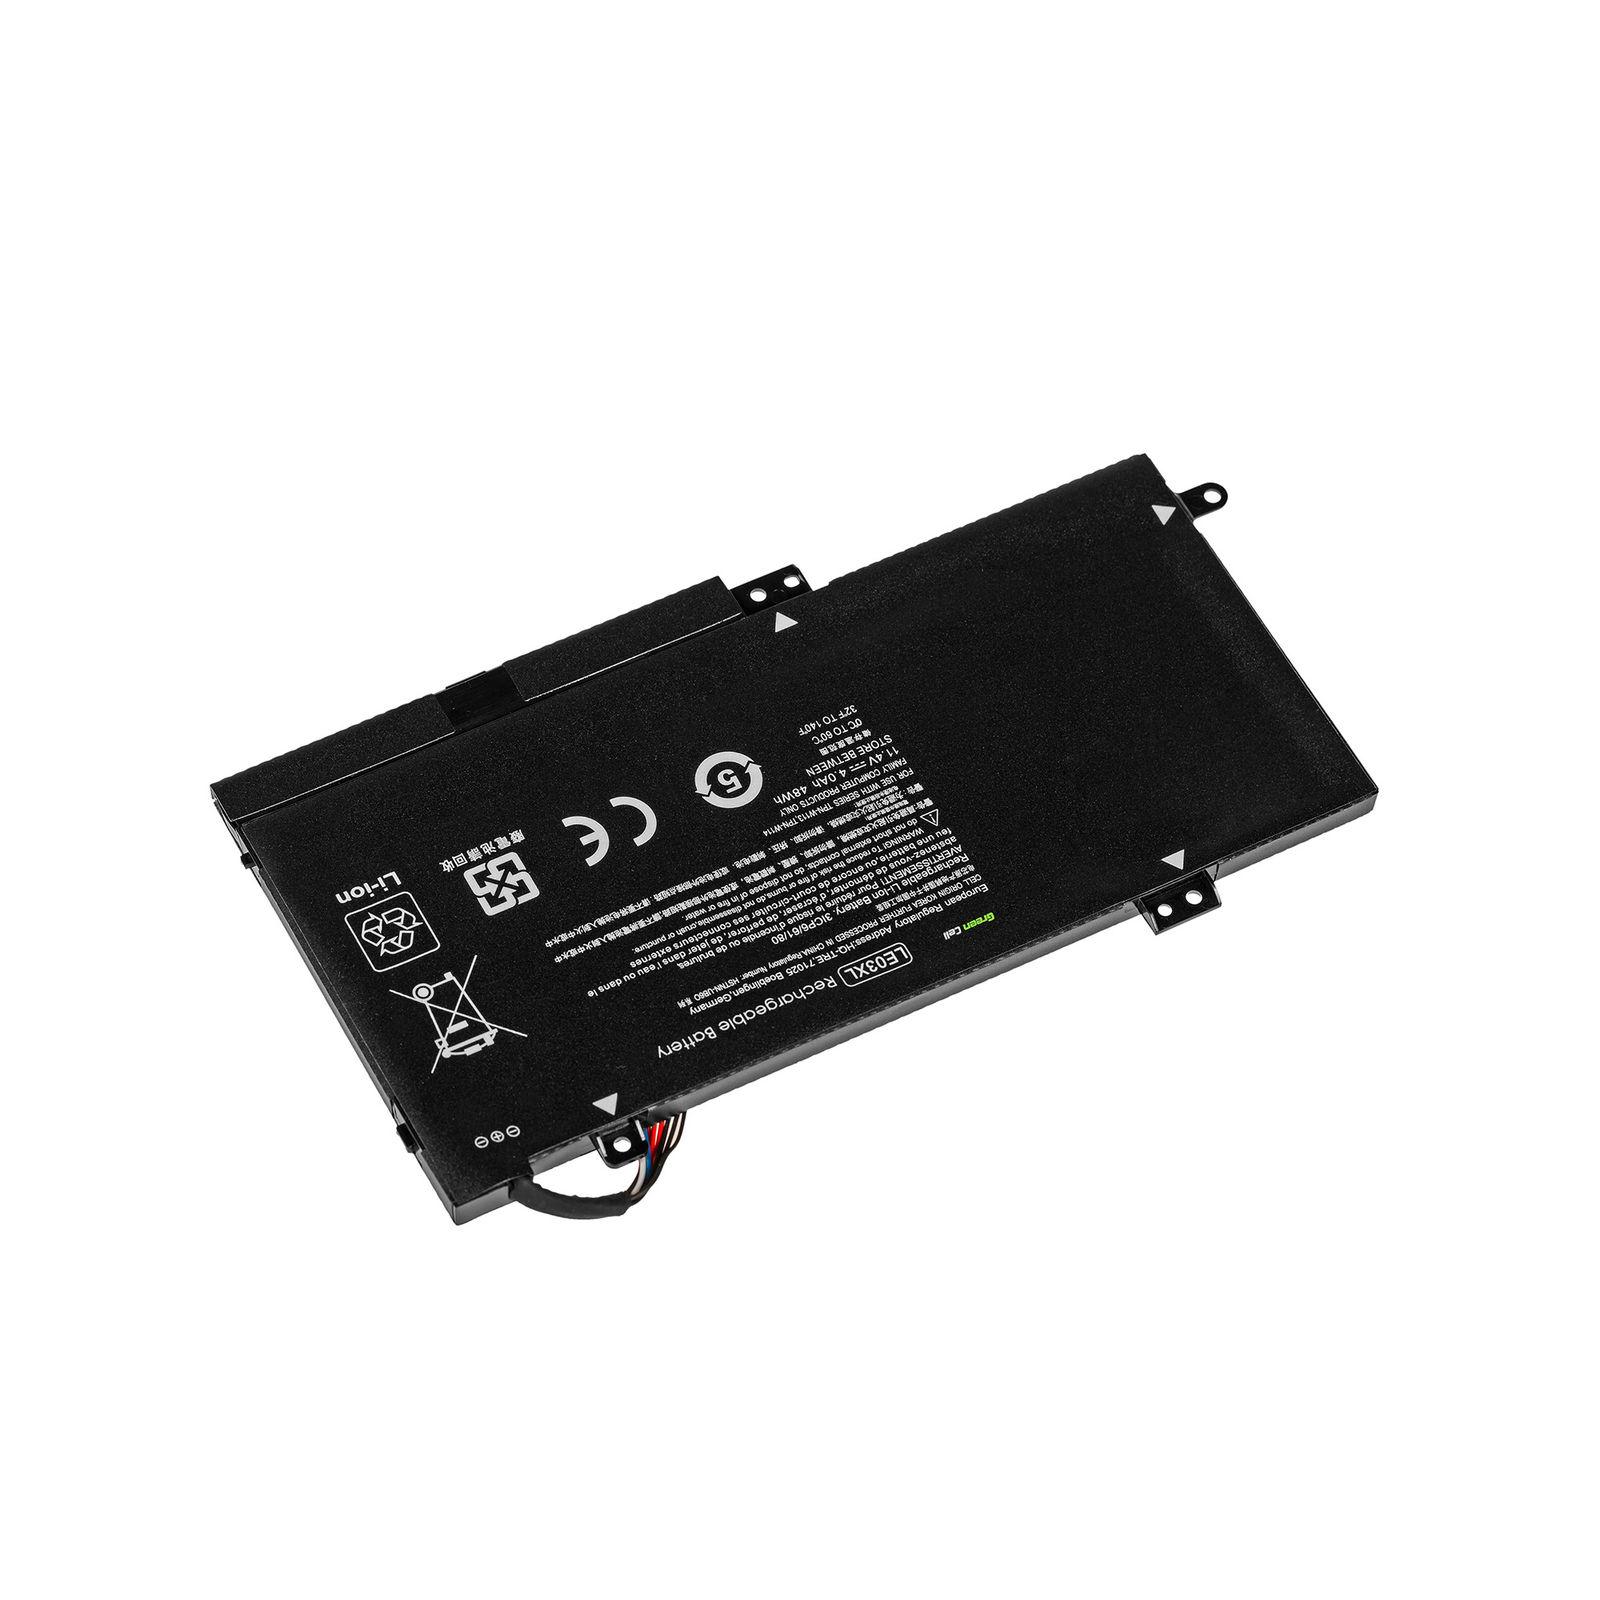 Accu voor HP Pavilion x360 15-BK057SA 15-BK060NA 15-BK060SA(compatibele batterij)